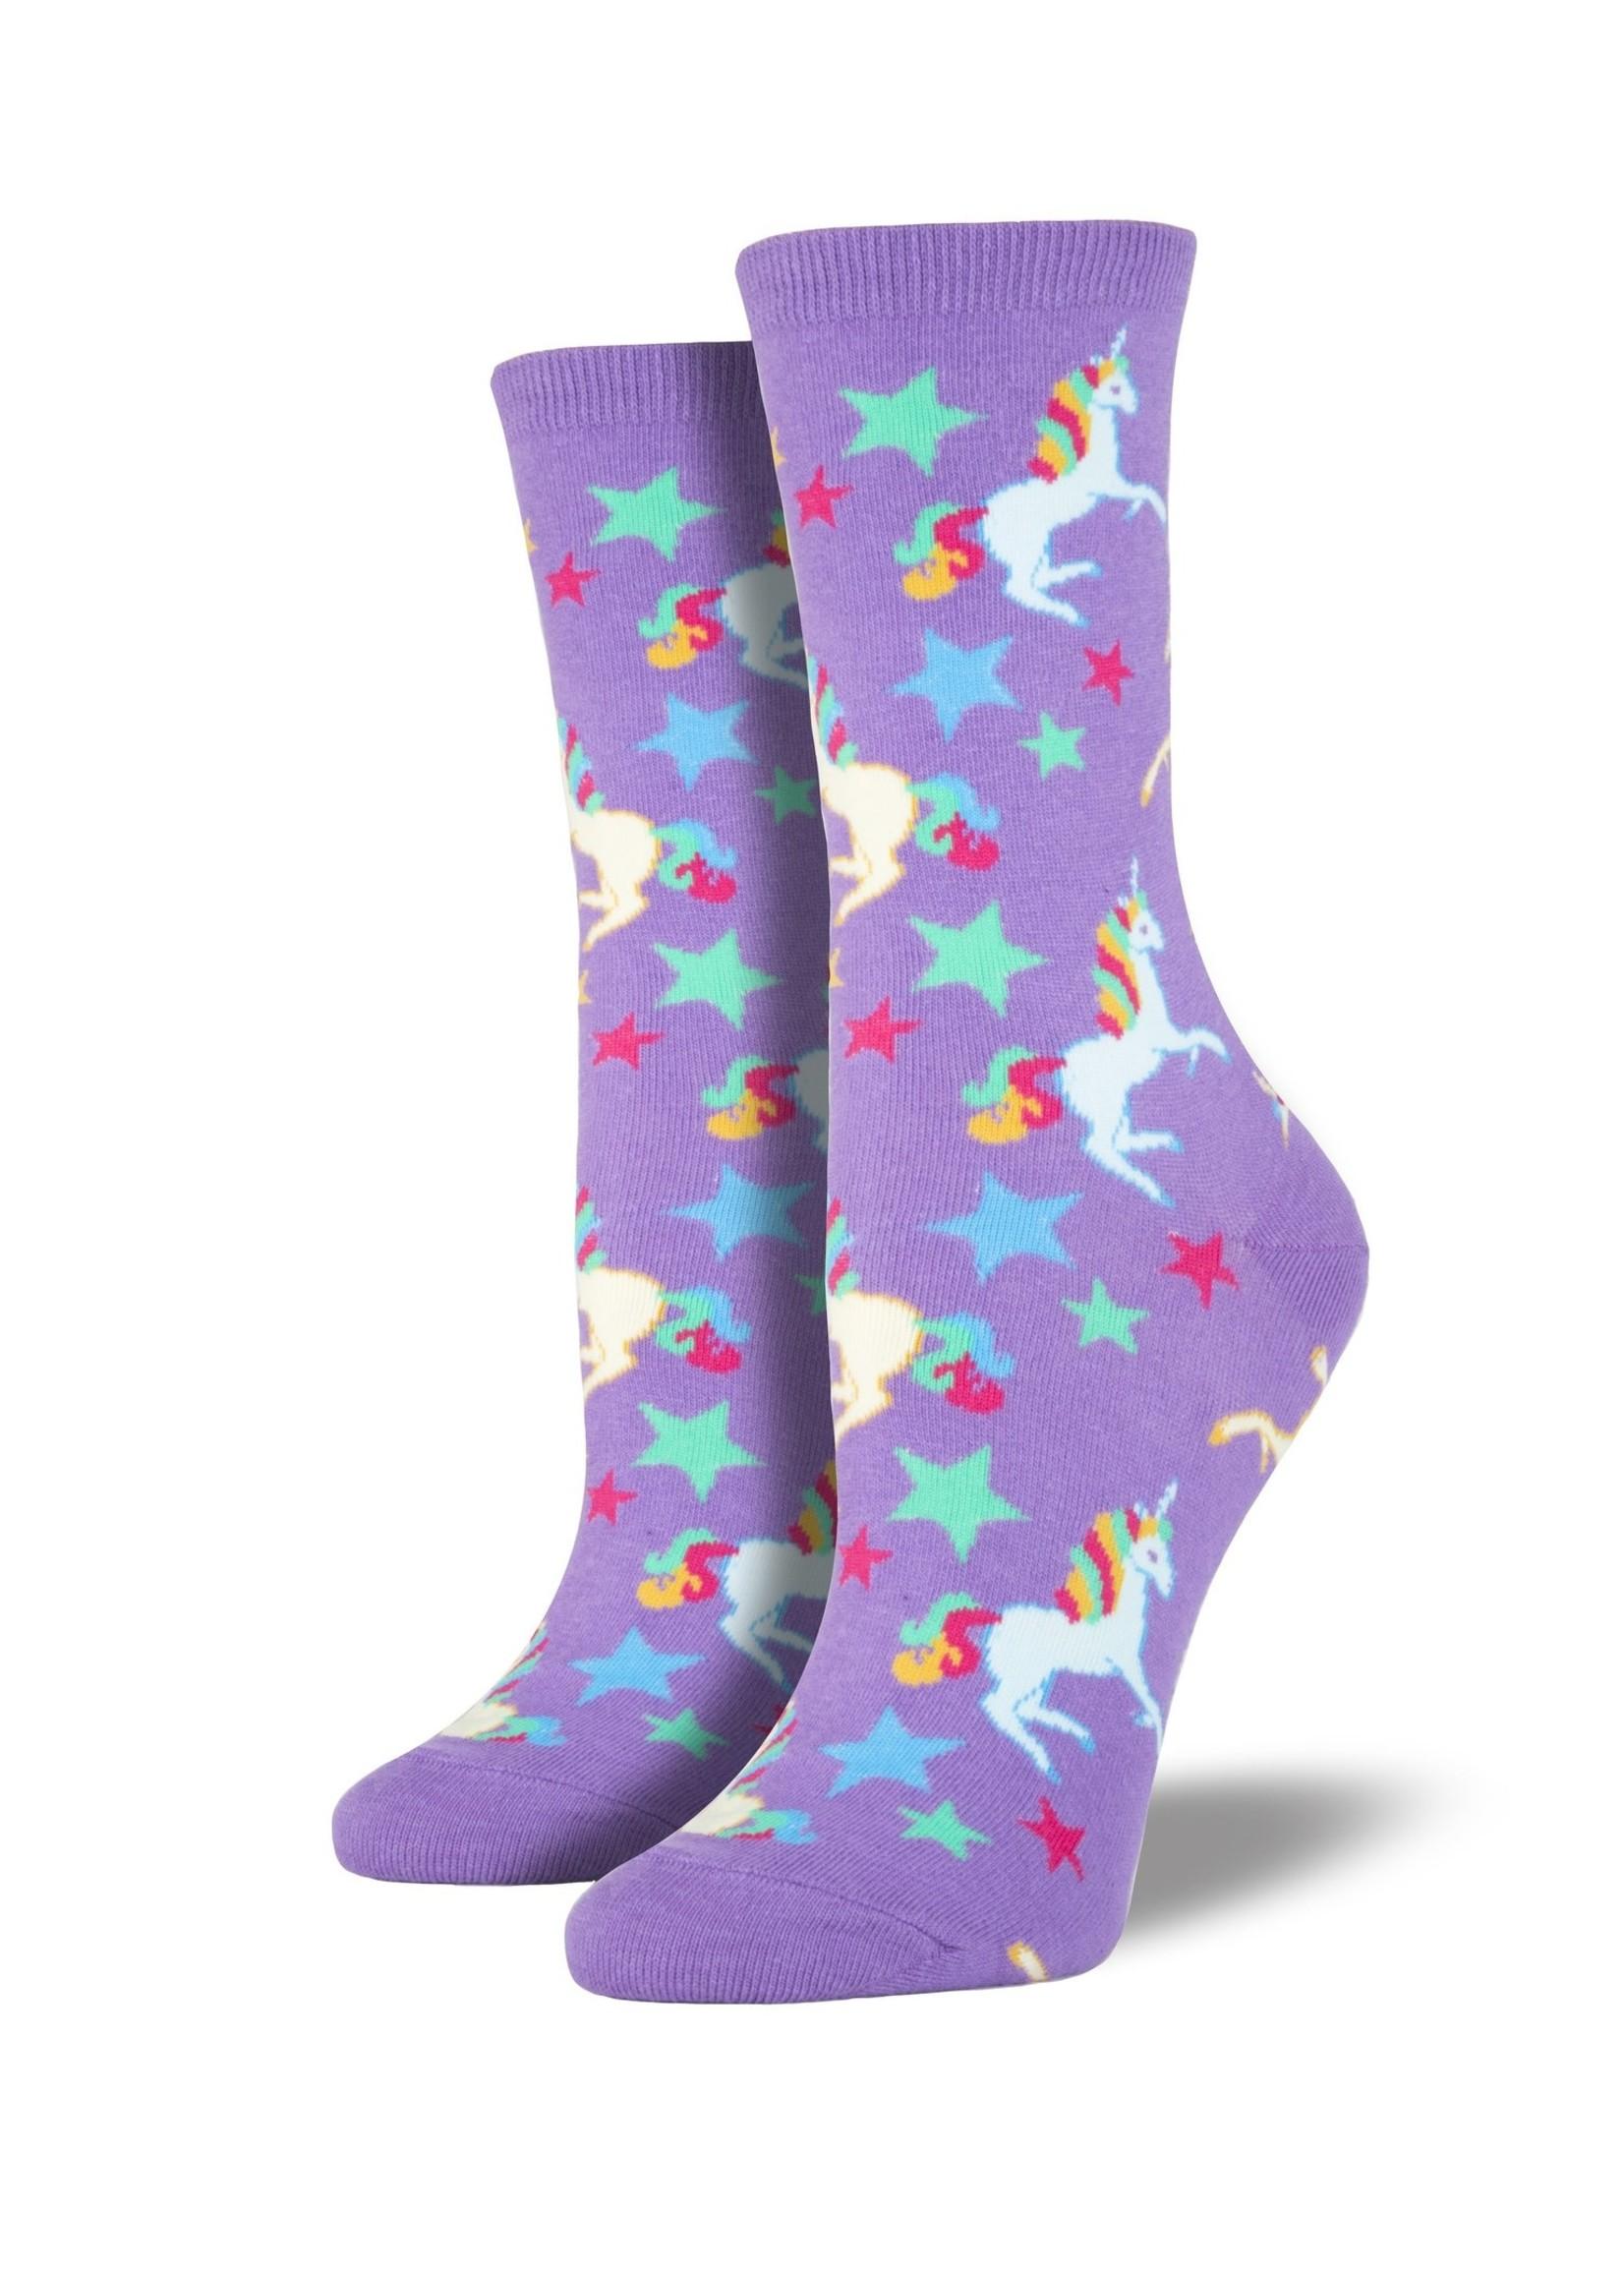 Socksmith Canada Inc WOMEN'S UNICORN SOCKS